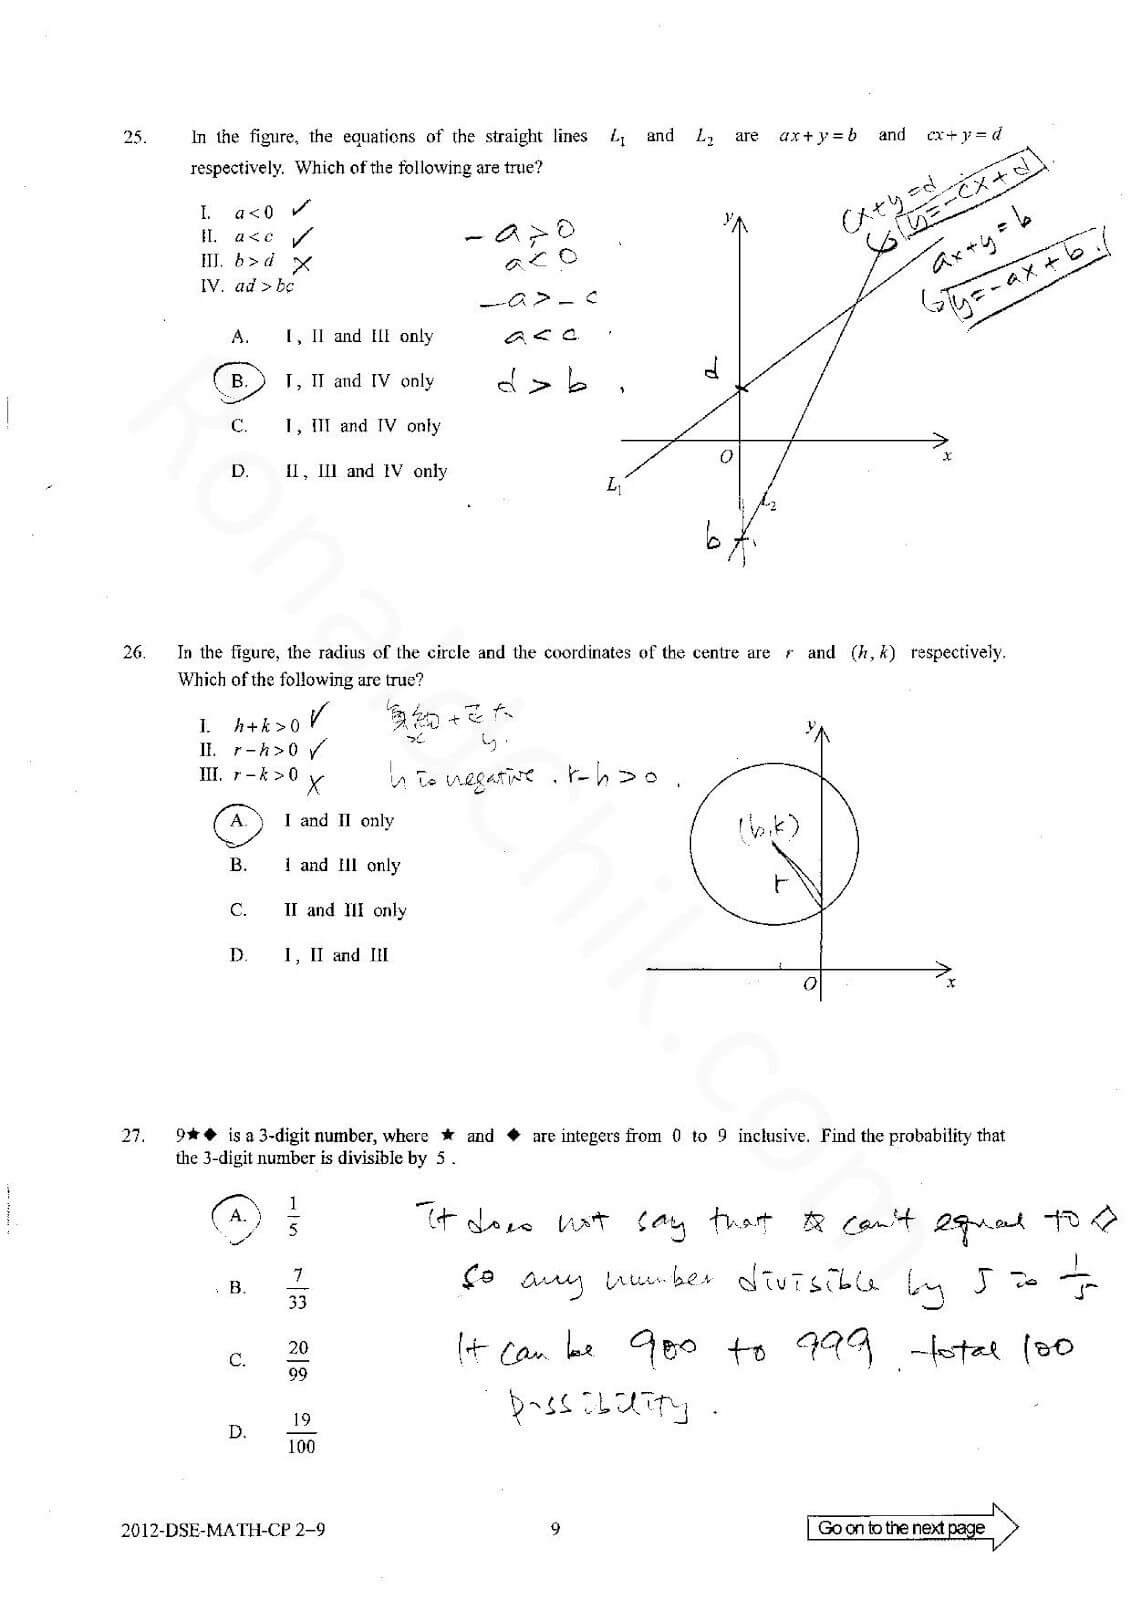 2012 DSE Math P2 卷二 Q25,26,27